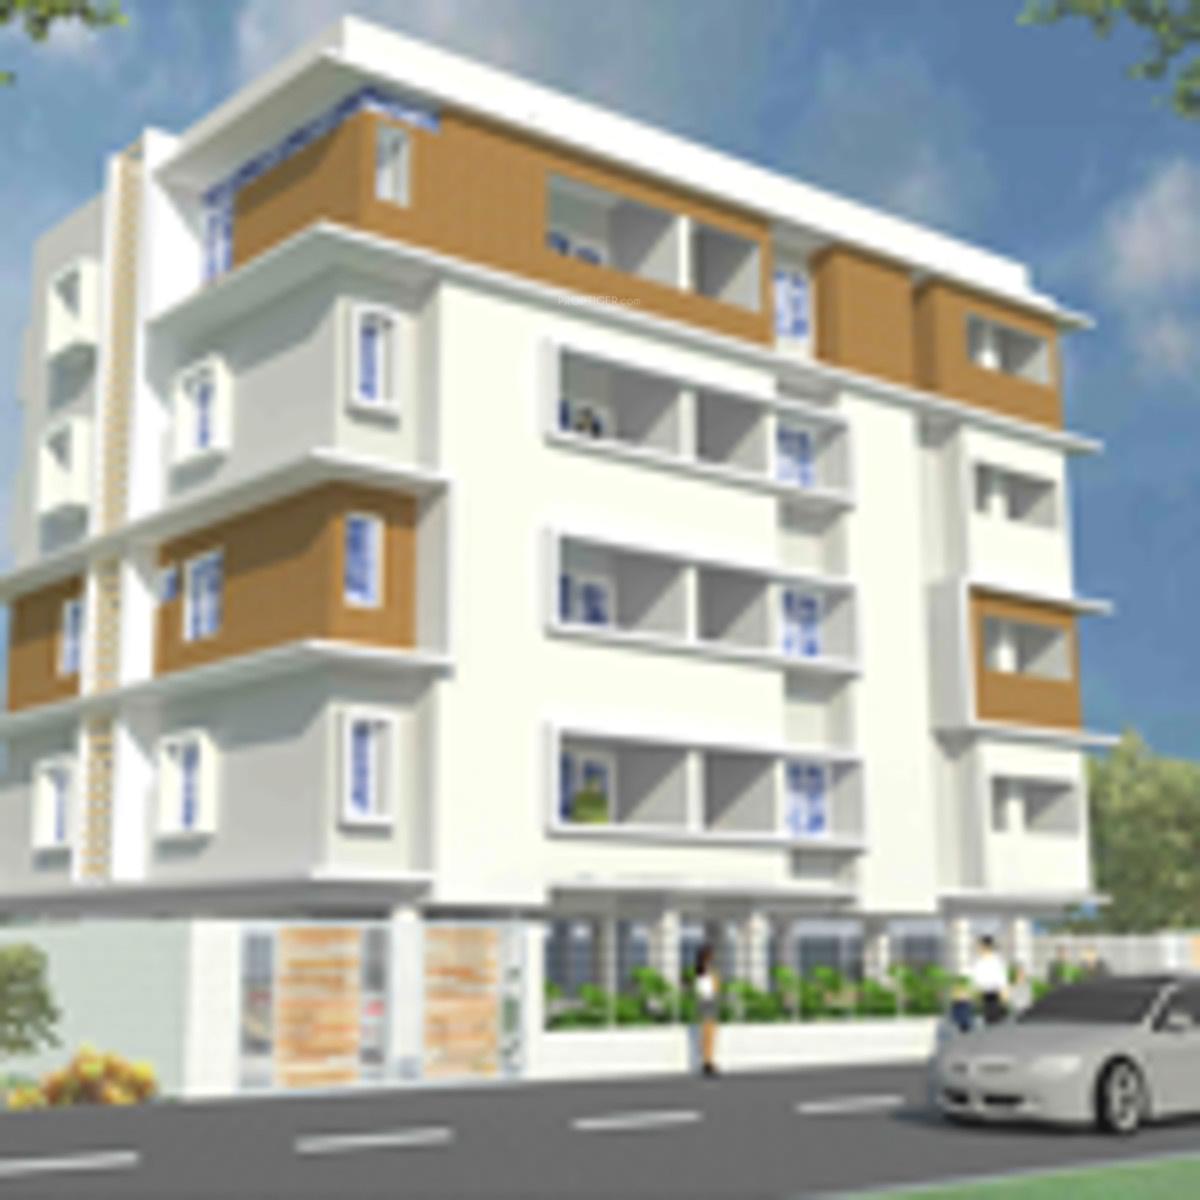 N Home Elevation Zone : Main elevation image of nivasan homes nivasana unit